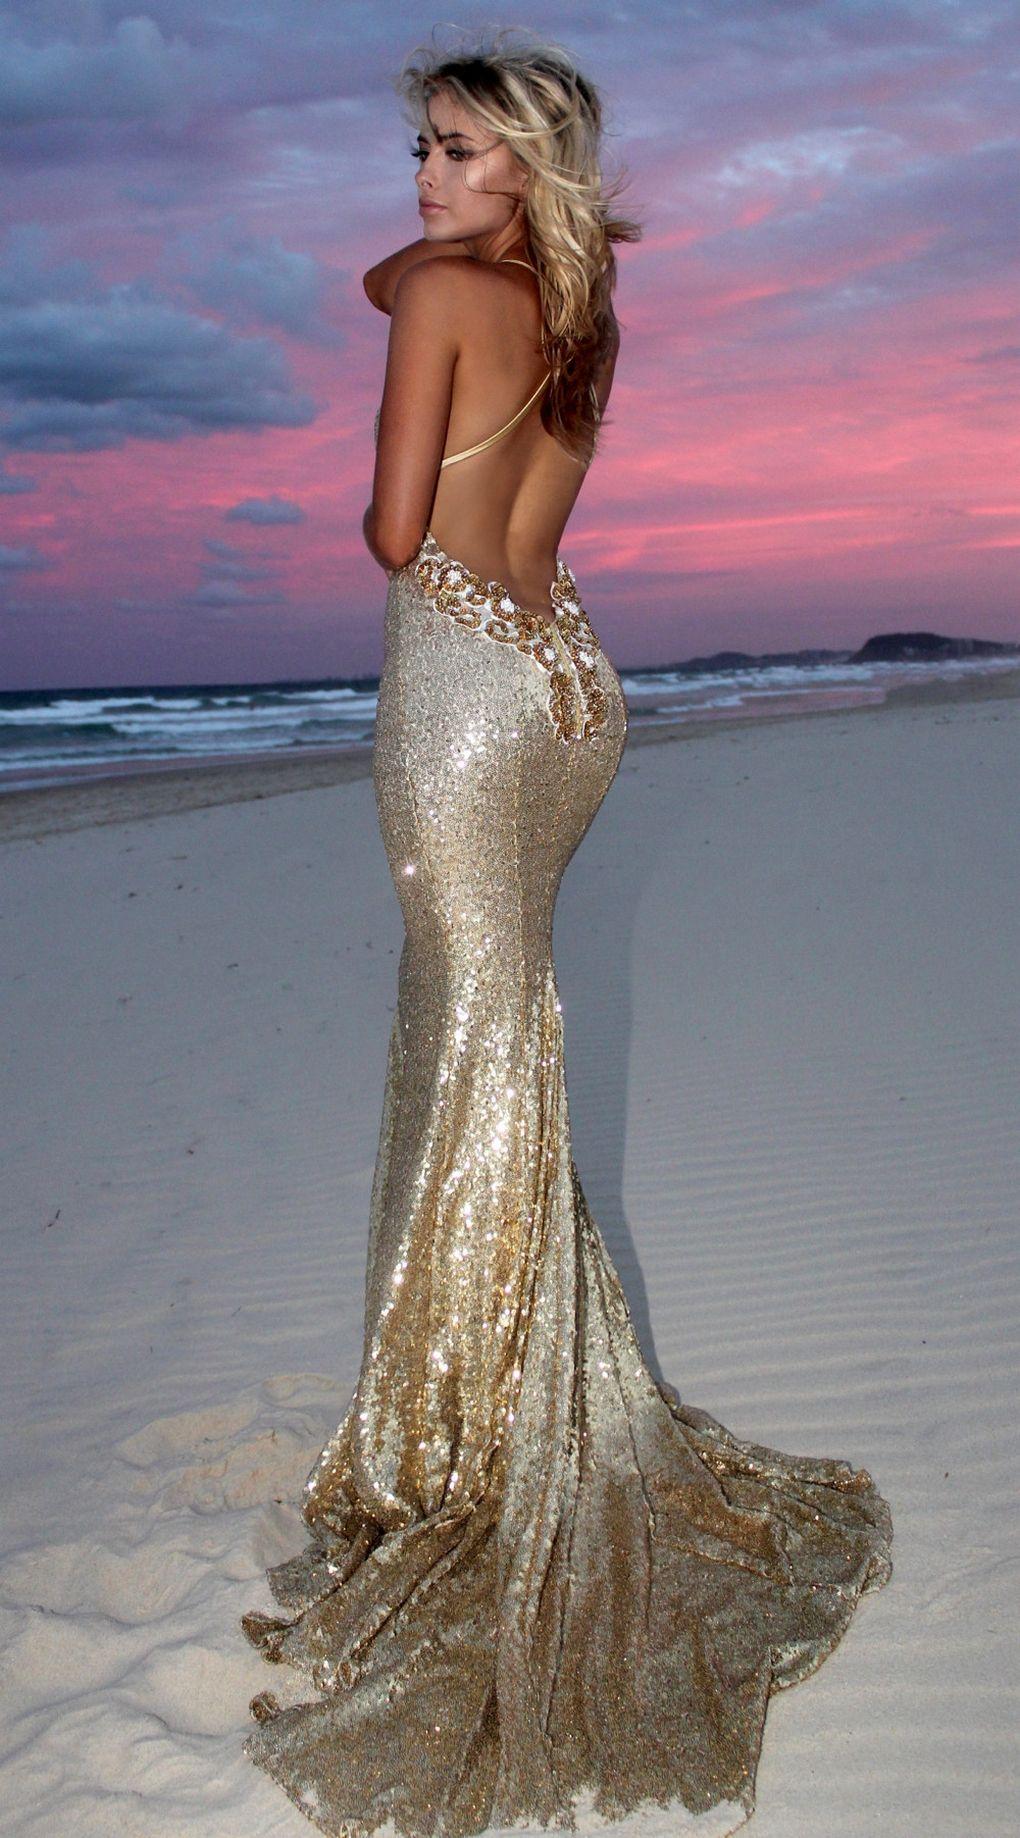 60 Perfect Beautiful Gold Dress Ideas Dresses Fancy Dresses Evening Dresses [ 1838 x 1020 Pixel ]